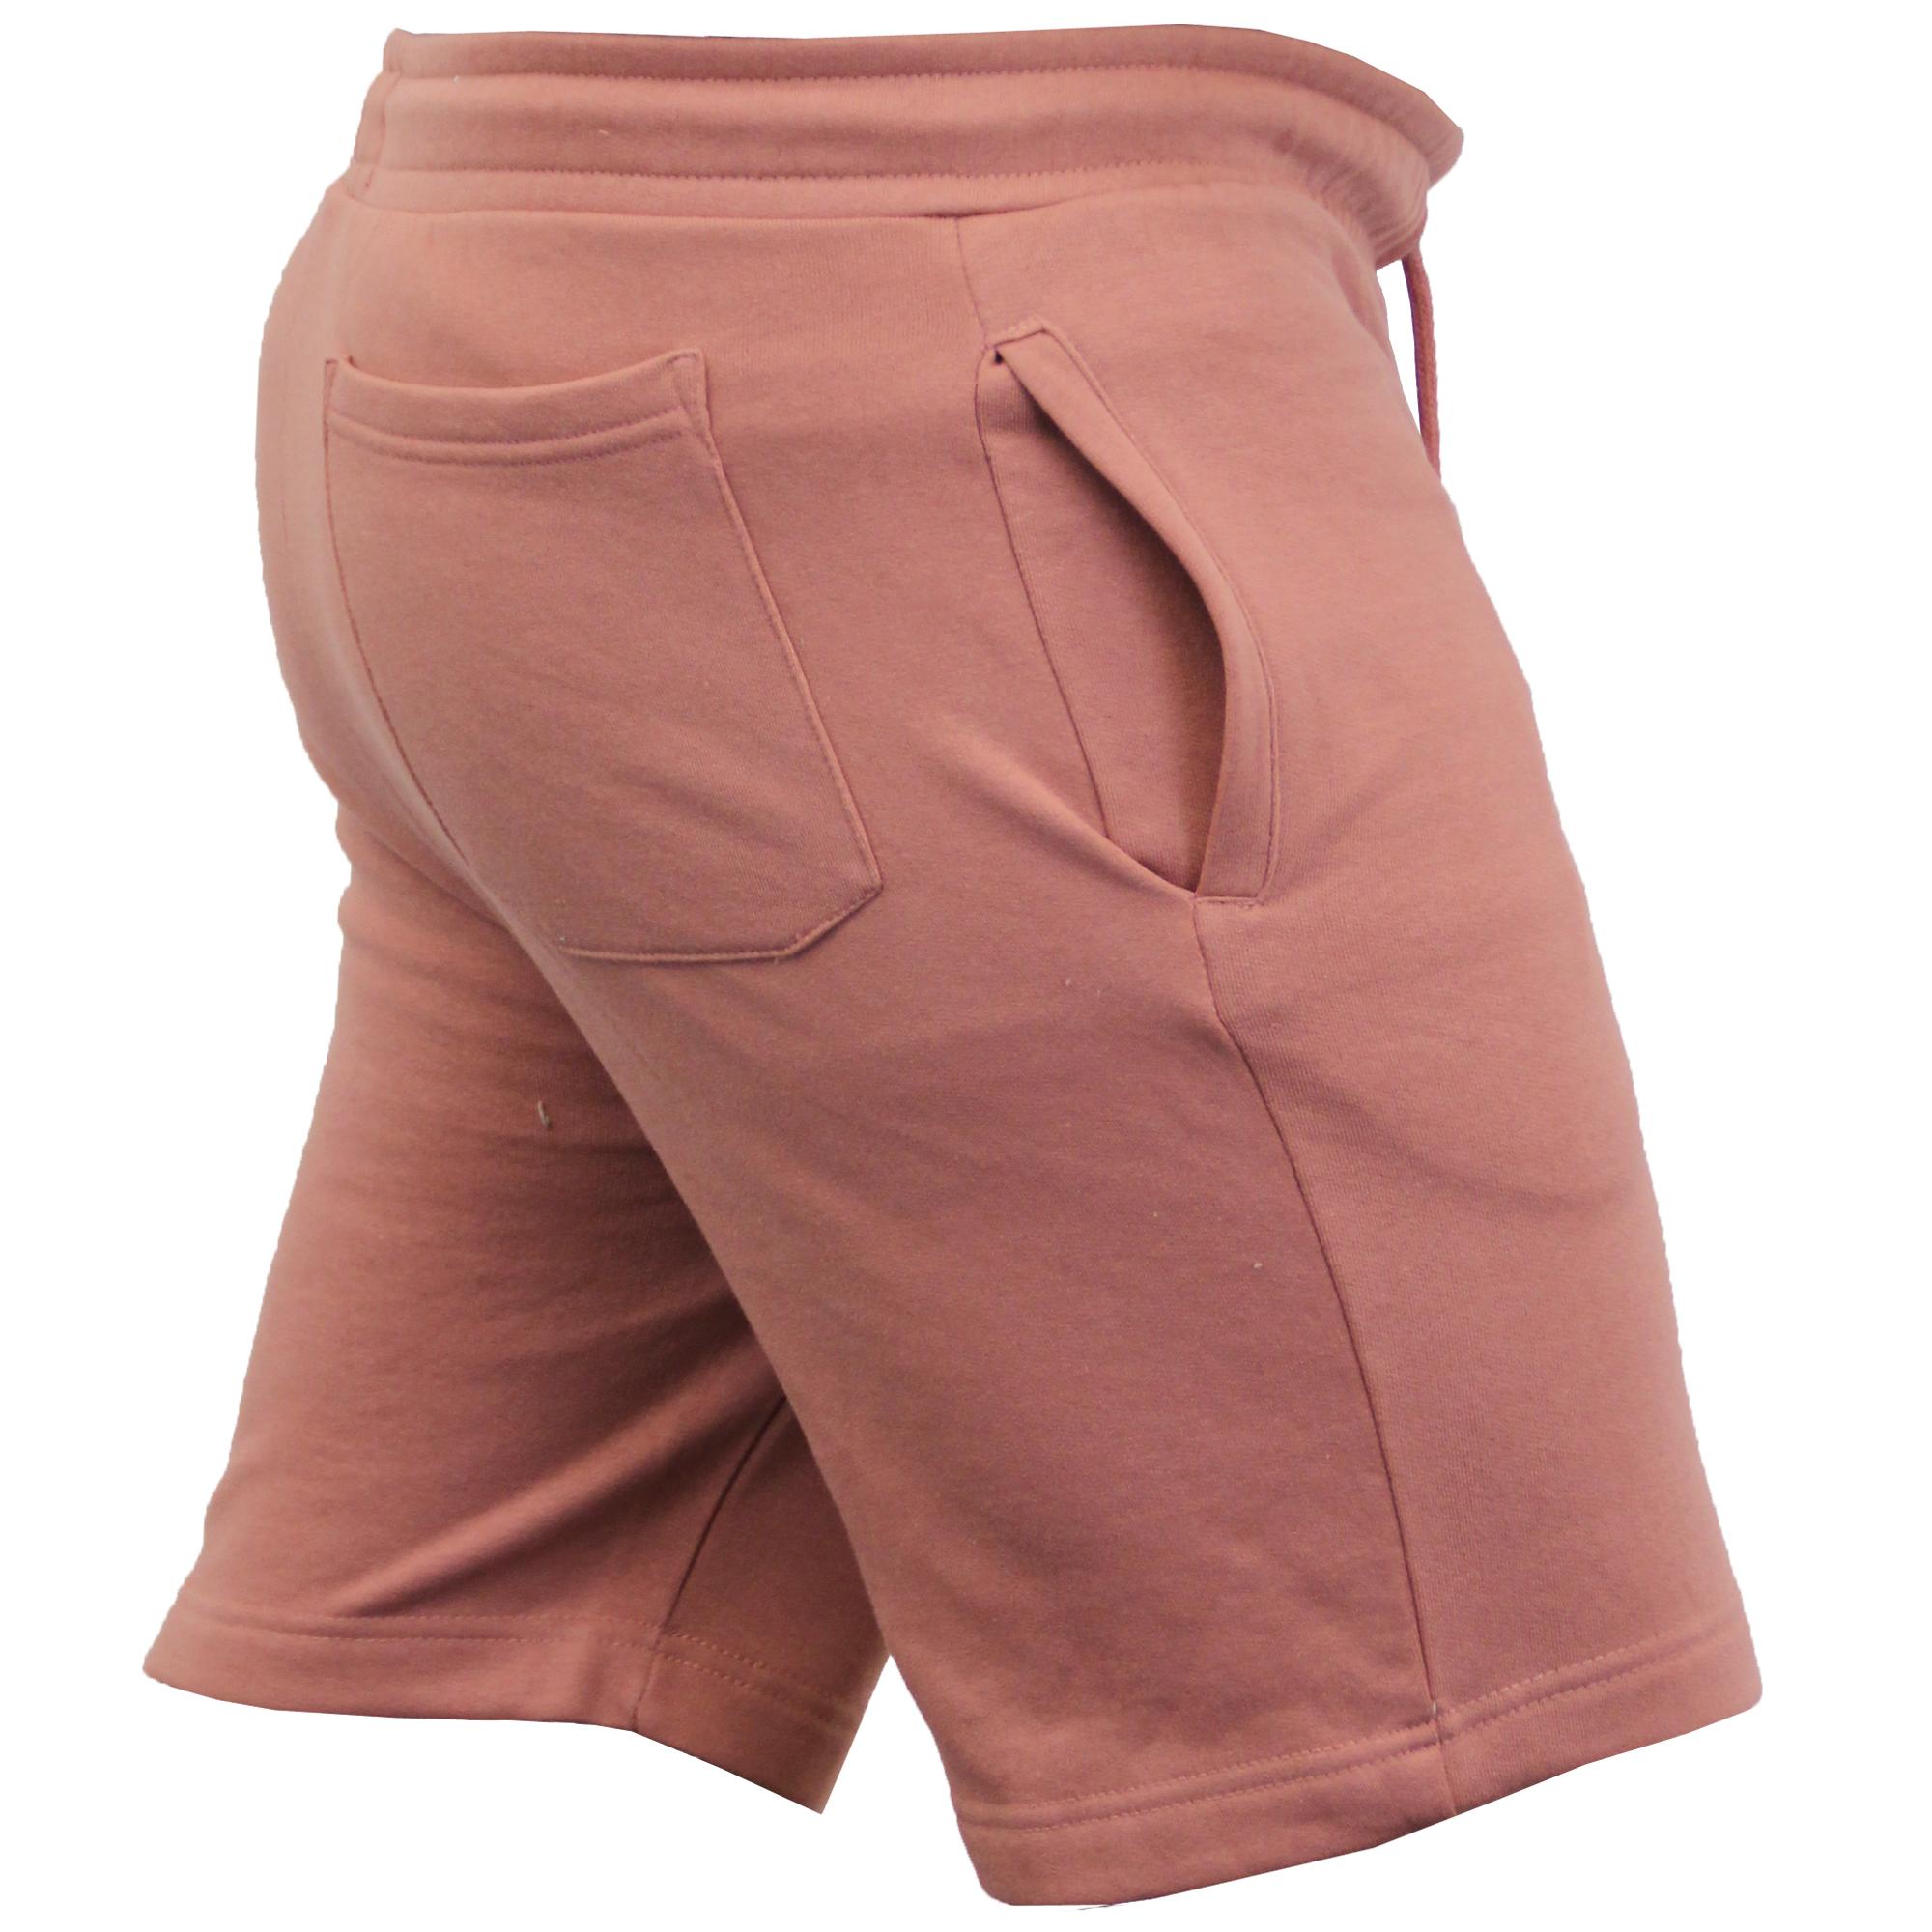 Mens-Jogger-Shorts-Tarley-by-Brave-Soul-Knee-Length-Casual-Fleece-Lined-Summer thumbnail 33